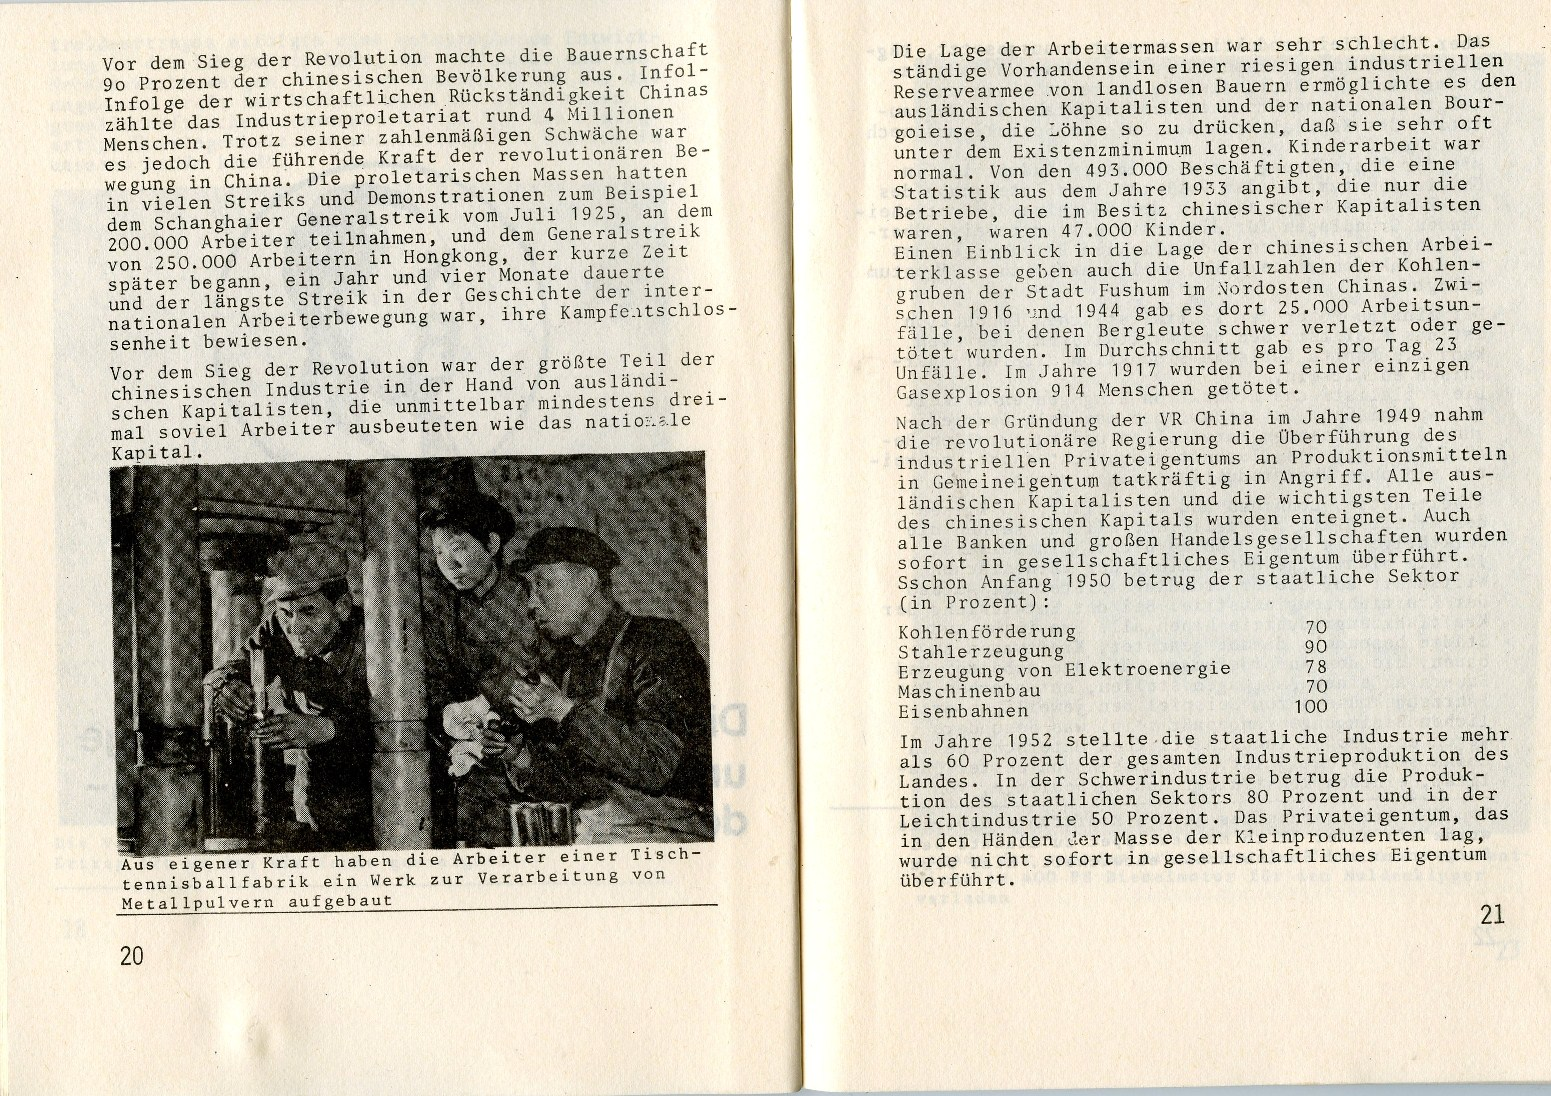 ZB_KPChinas_1971_12